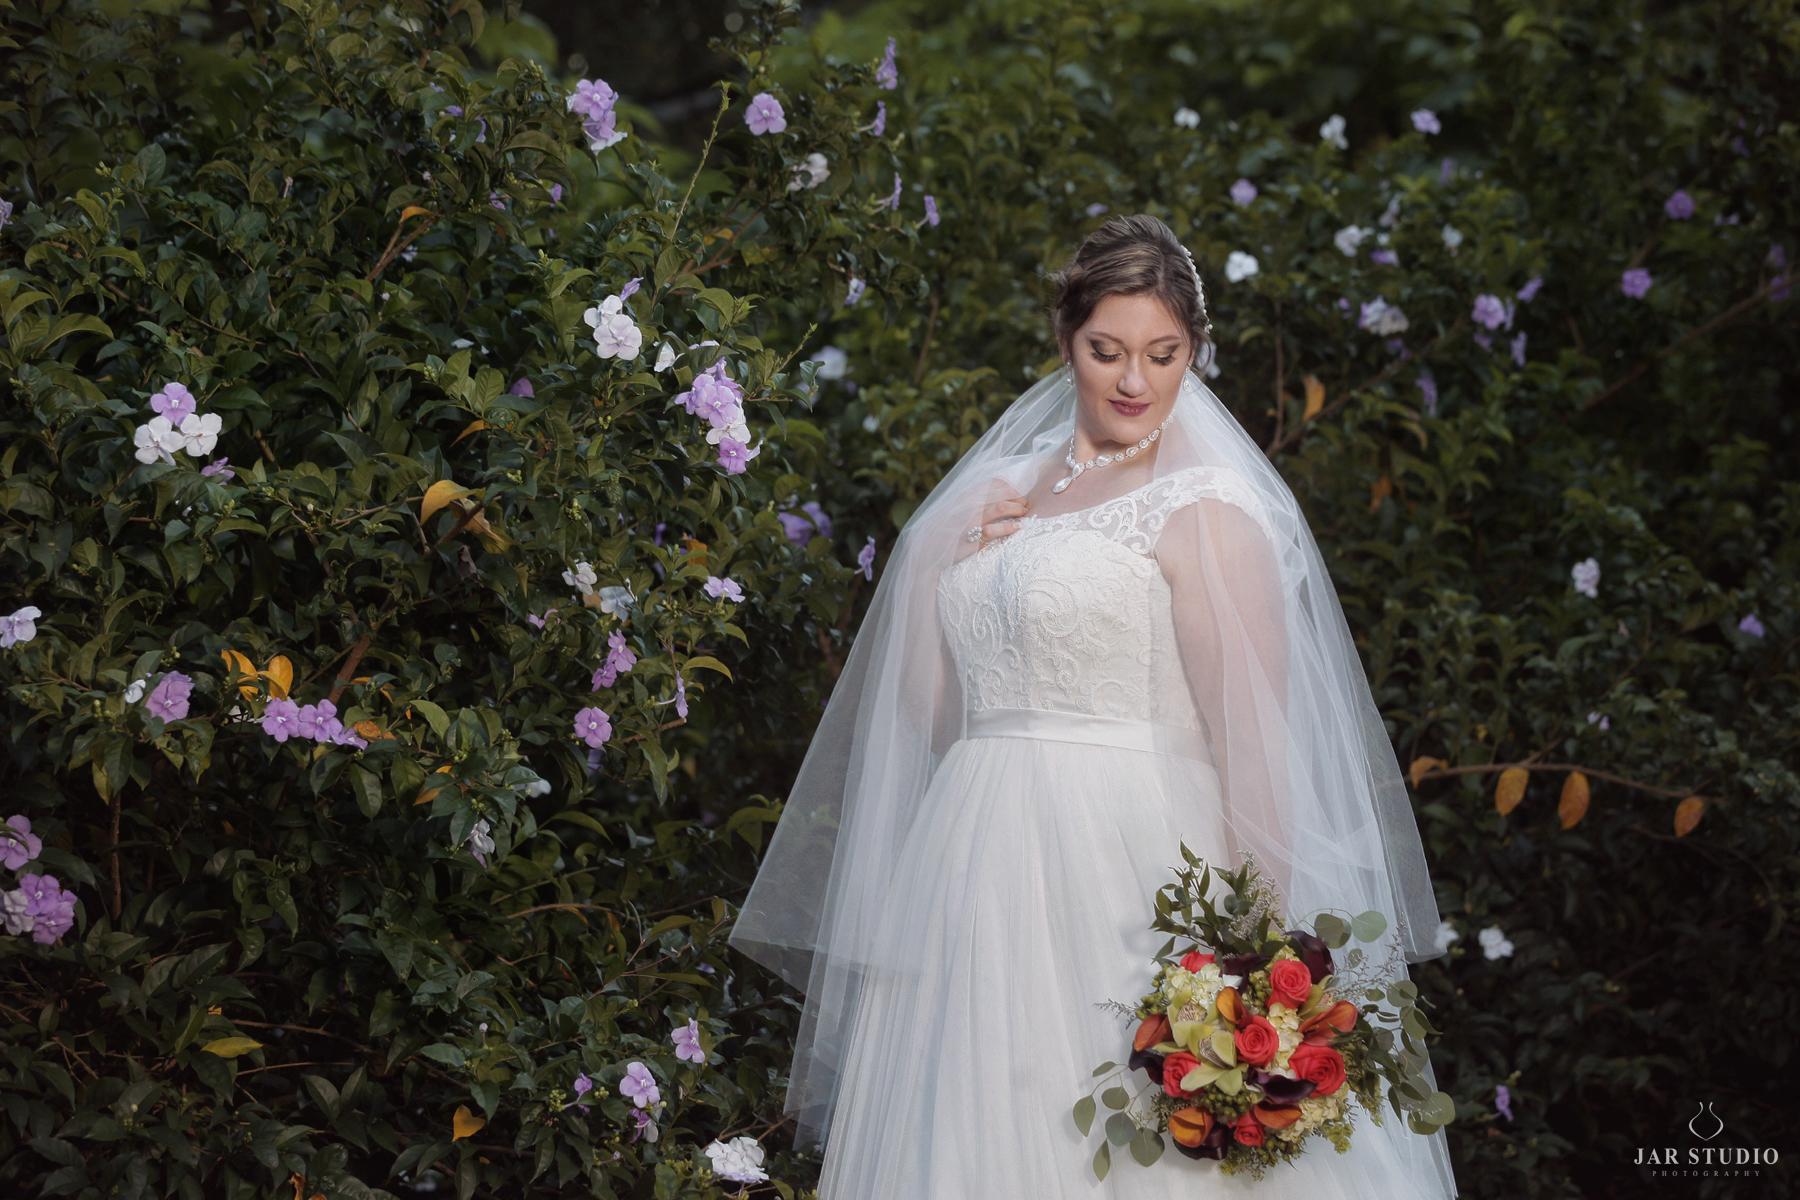 03-orlando-garden-wedding-flowers-lake-wales-jarstudio-photographer.JPG